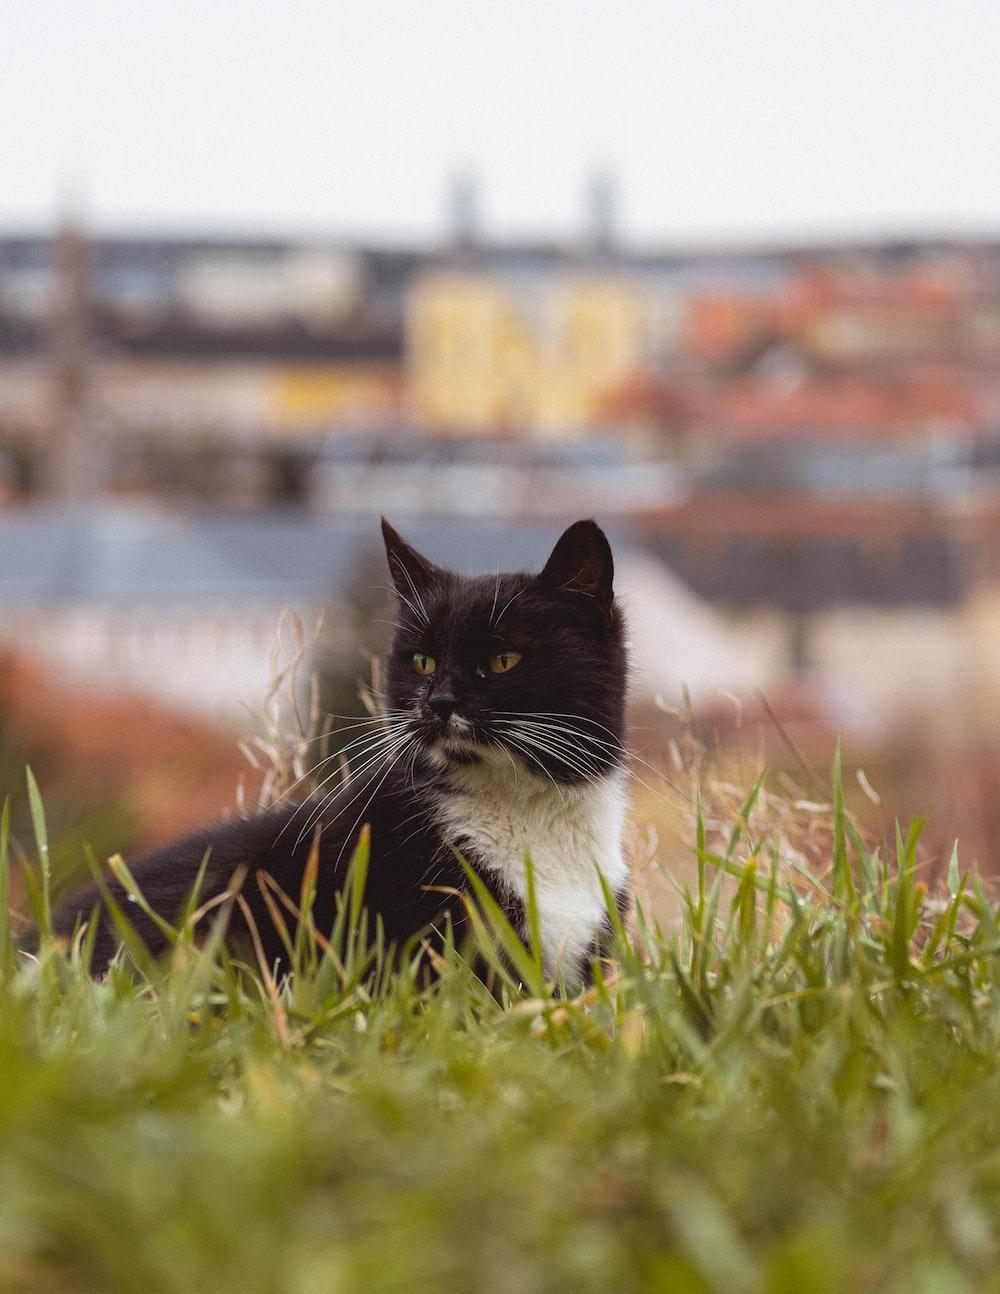 tuxedo cat on green grass during daytime